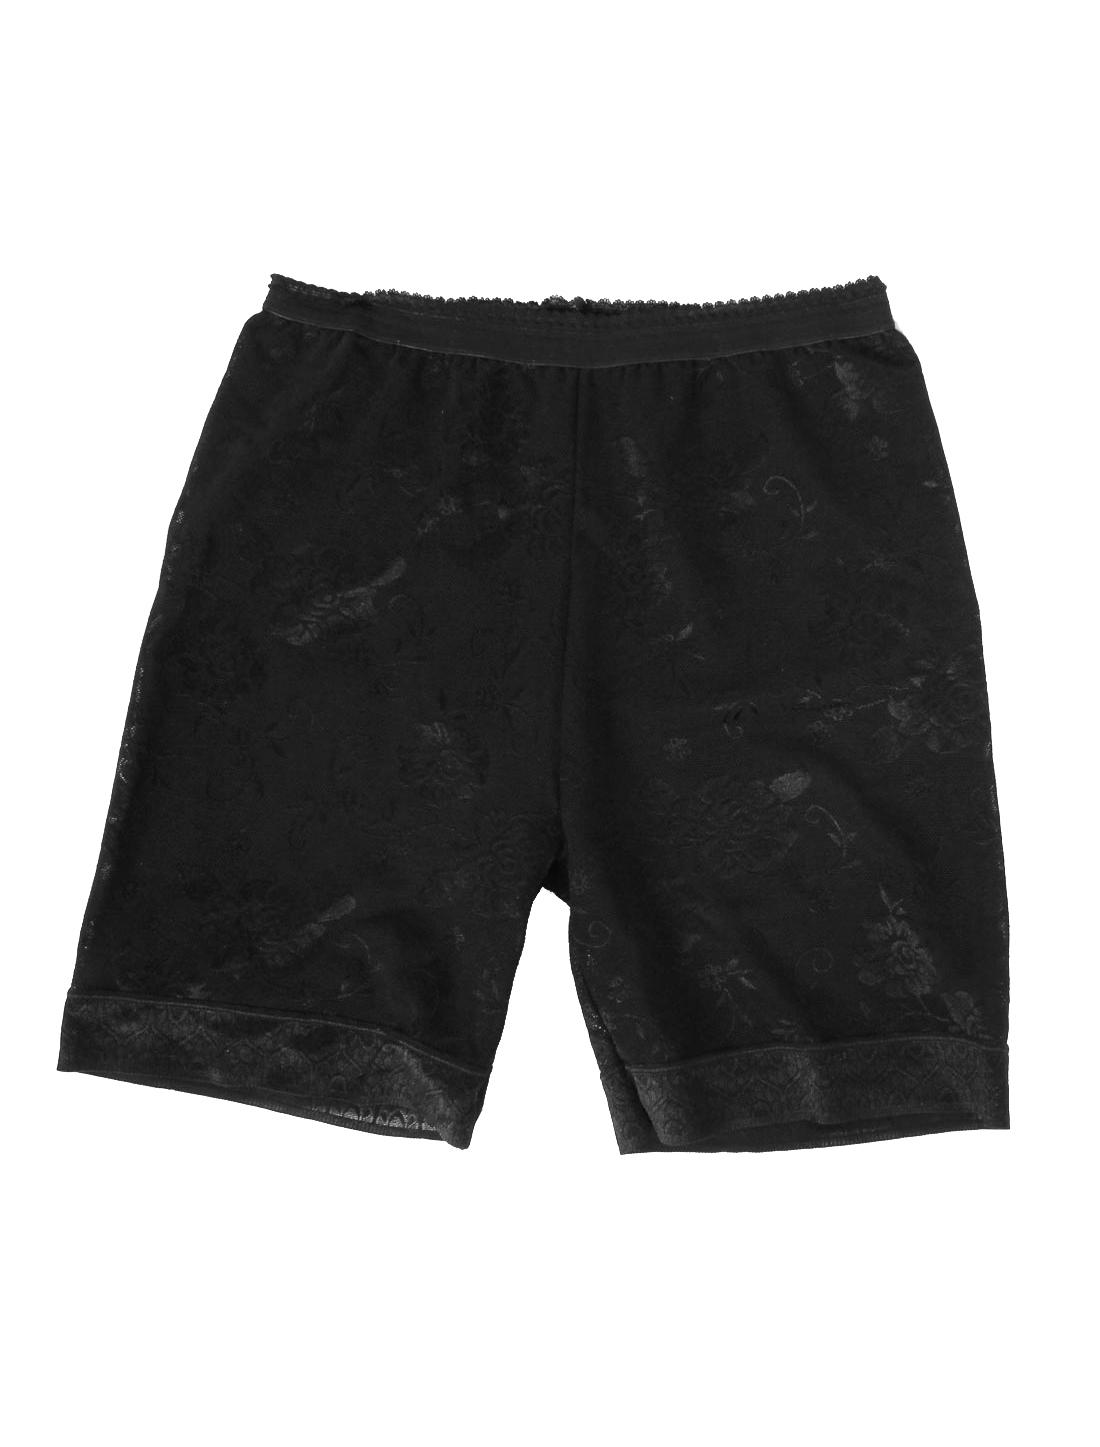 Ladies Flower Print Elastic Waist Safety Shorts Pants Black S